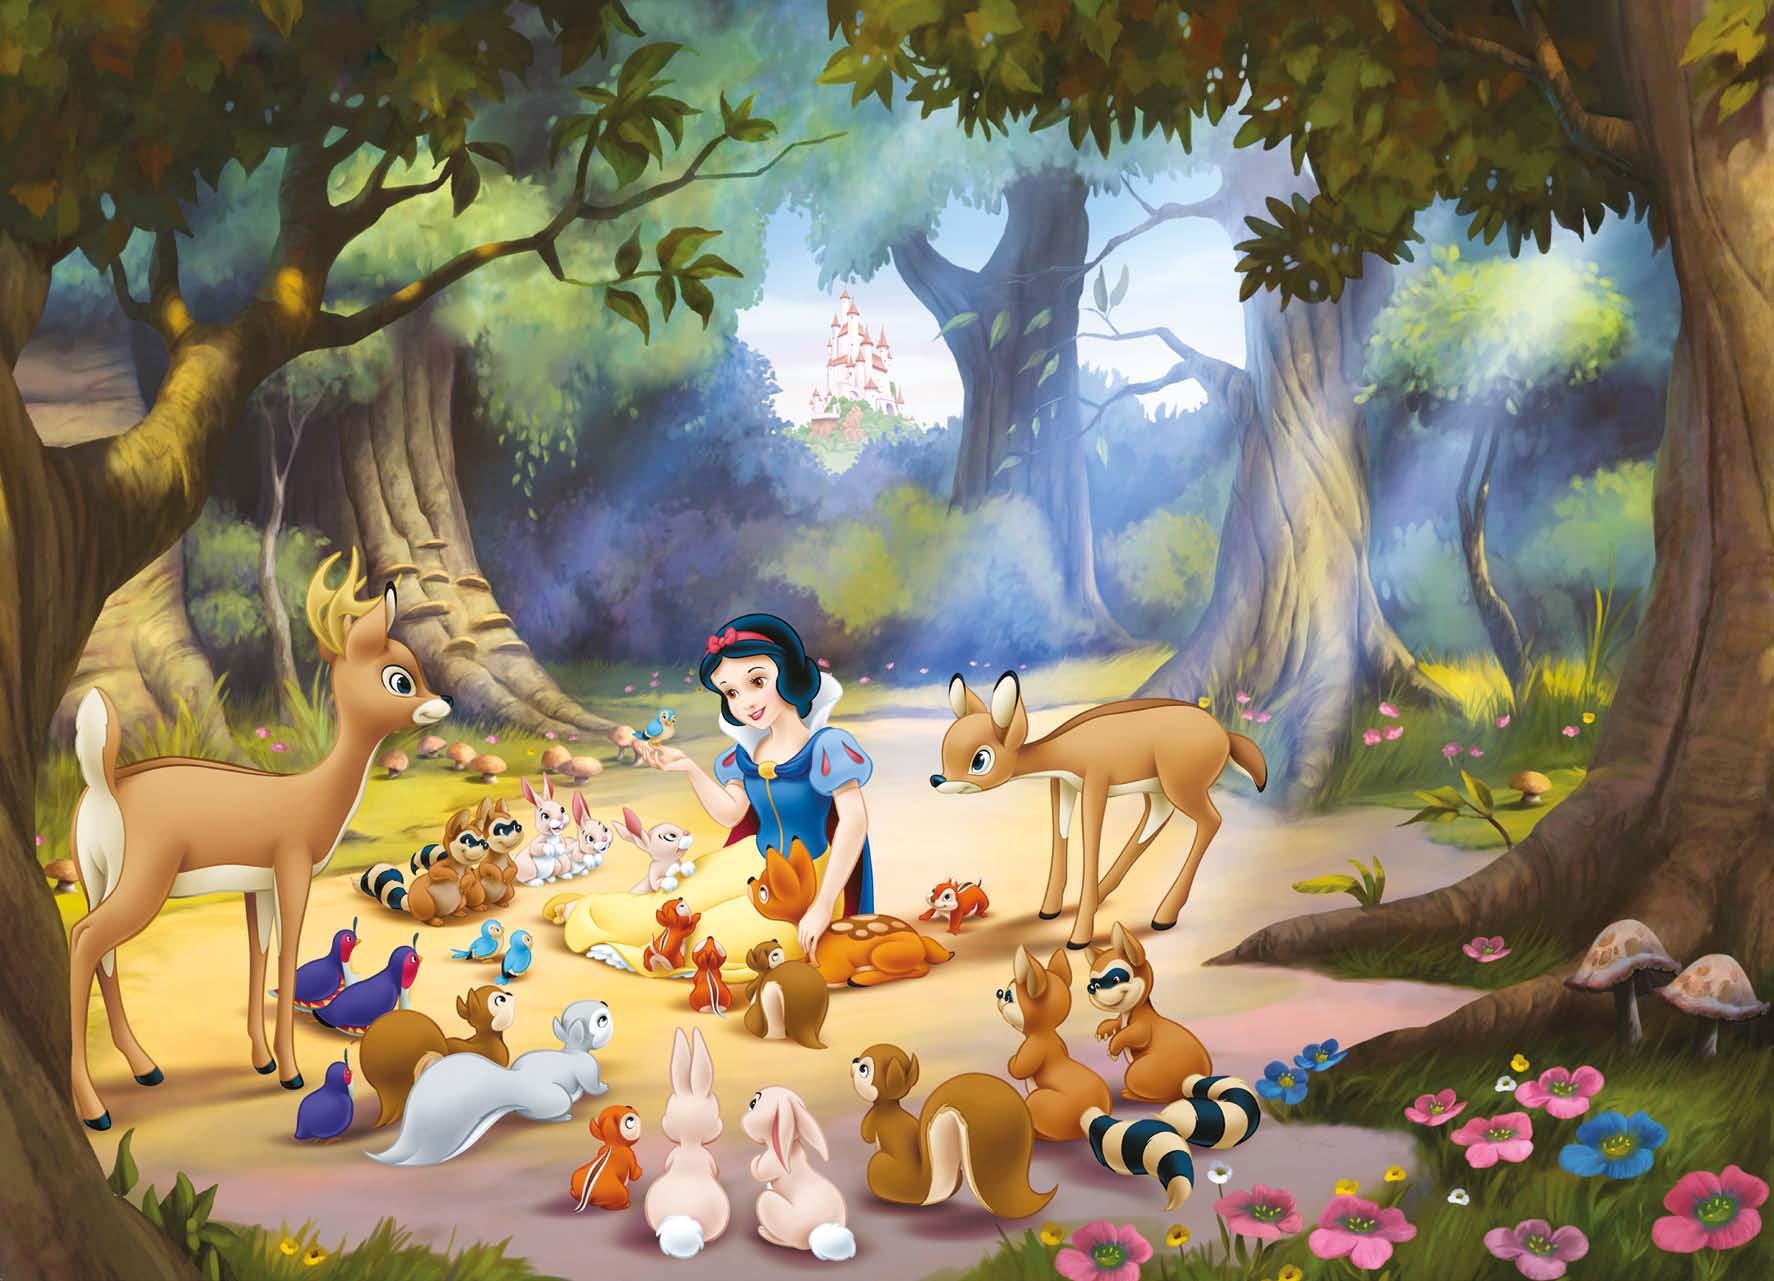 Poster mural Blanche Neige et ses amis - Panoramique Disney - KOMAR